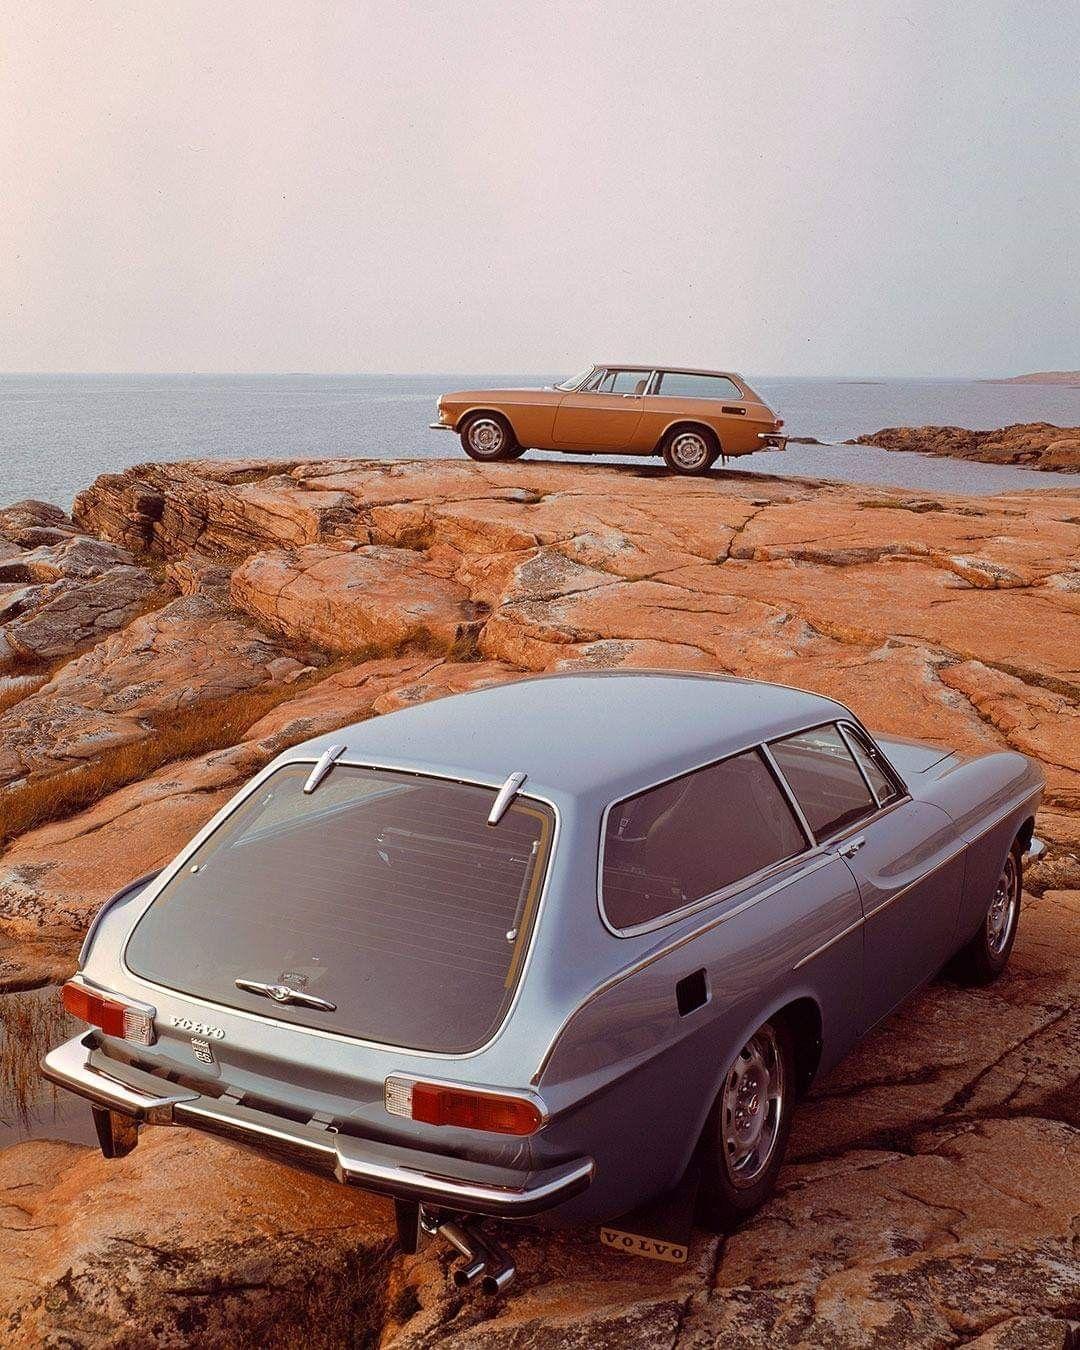 Volvo, Volvo Cars, Sports Cars Luxury